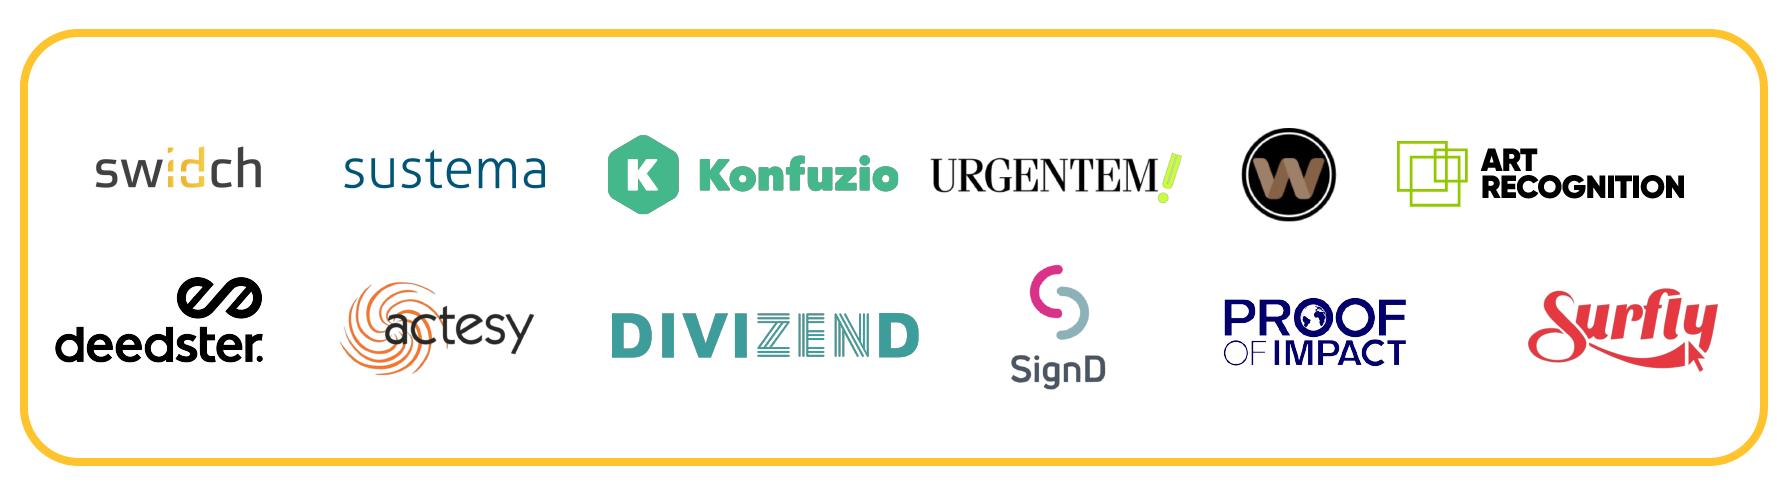 Logos of startups Swidch, sustema, konfuzio, urgentem!, deedster., actesy, divizend, signD, proof of impact, surfly, weave.ai, art recognition